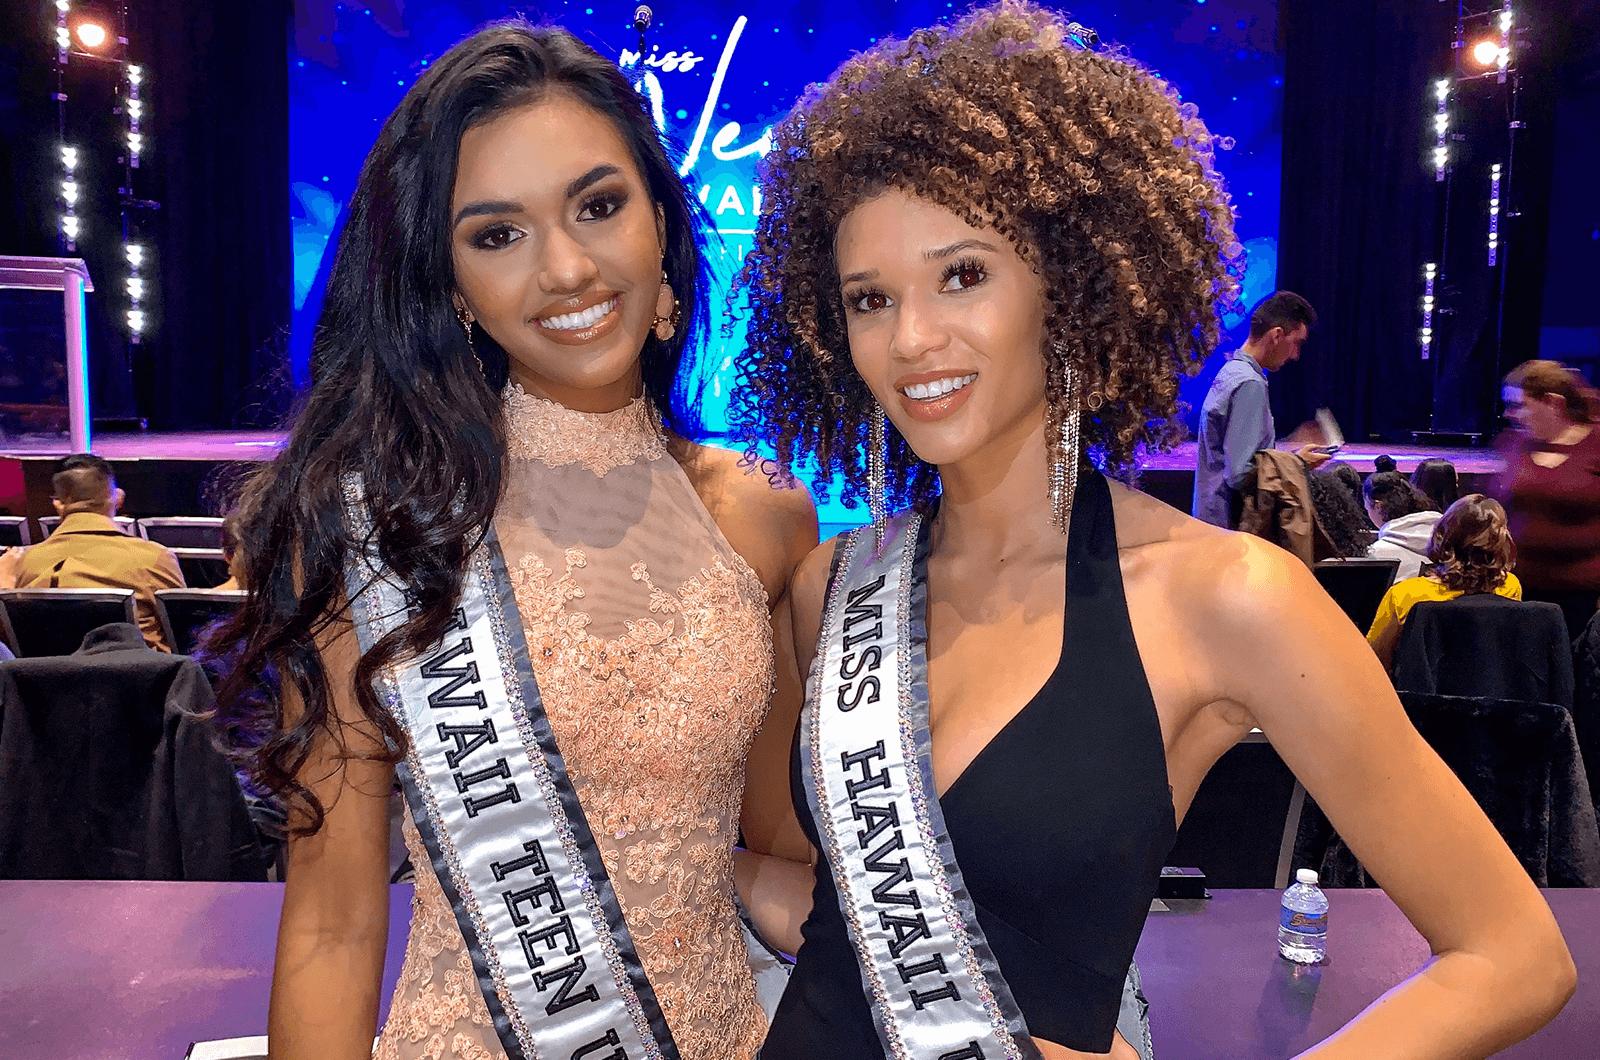 Miss Hawaii Teen USA Kiʻilani Arruda (left), poses with Neyland at an event.